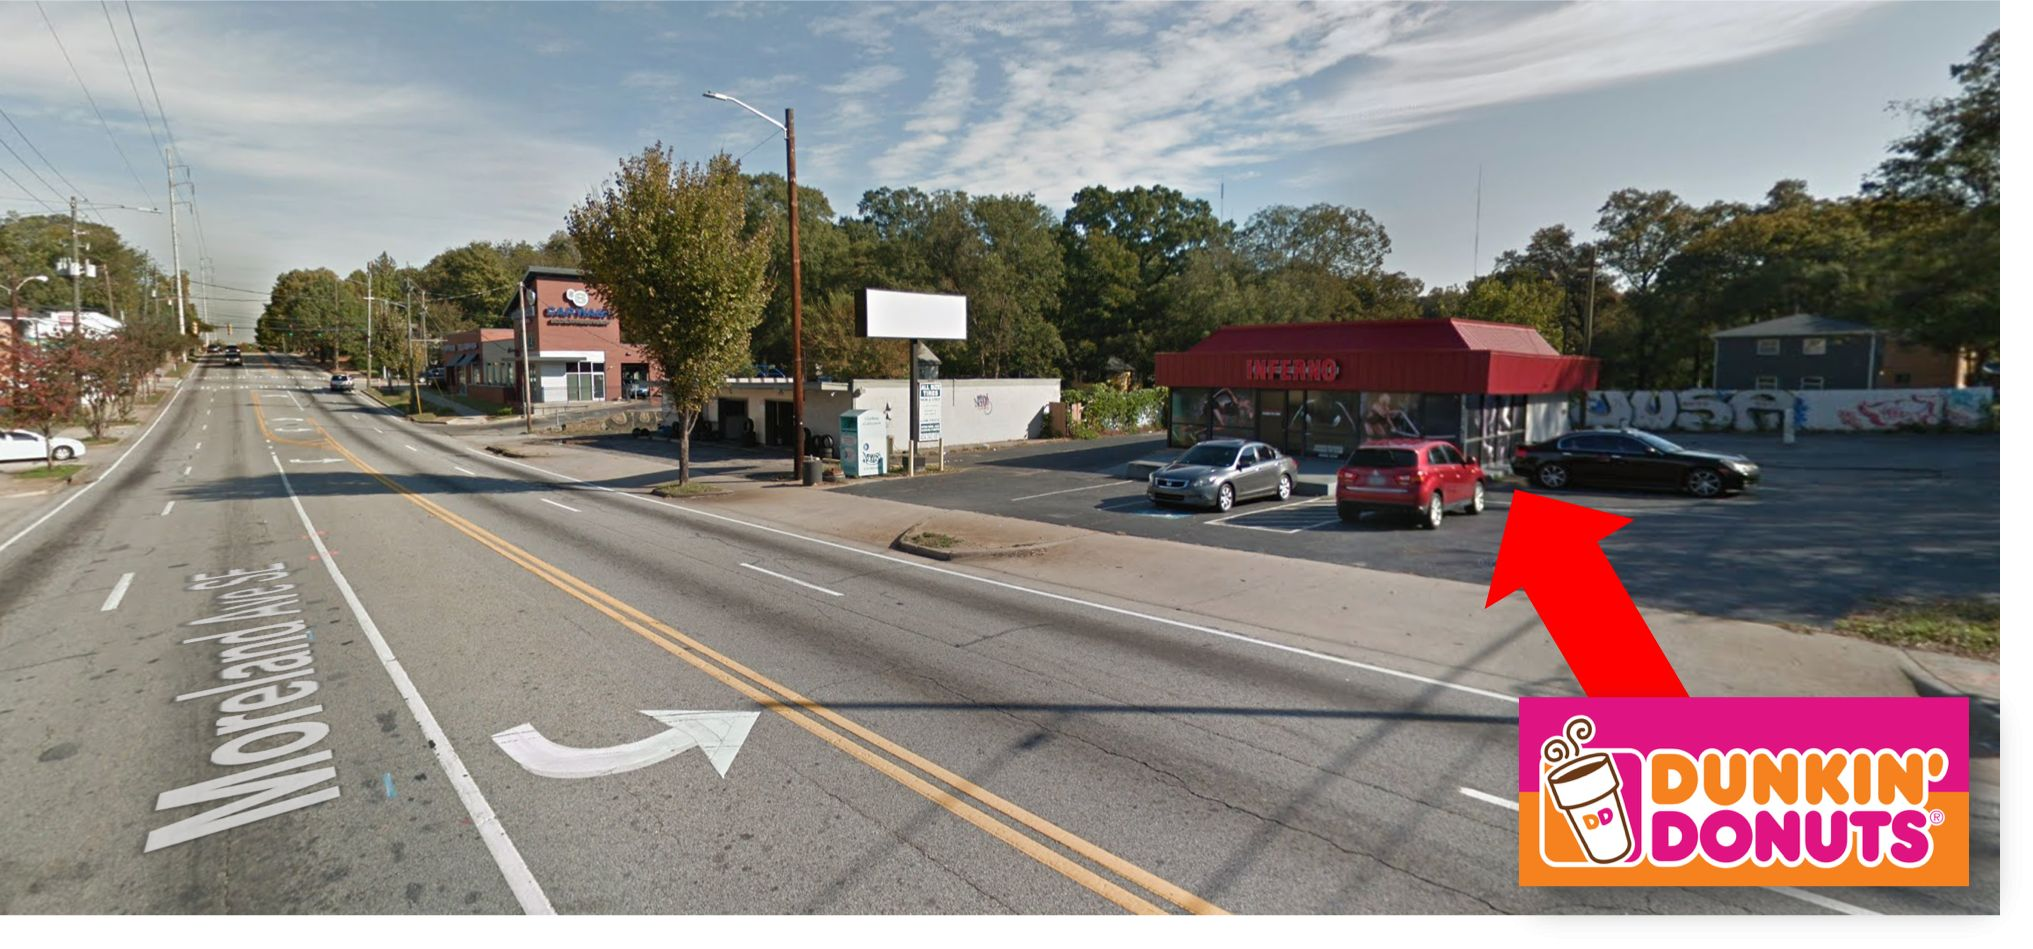 Dunkin' Donuts - 30 Moreland Avenue